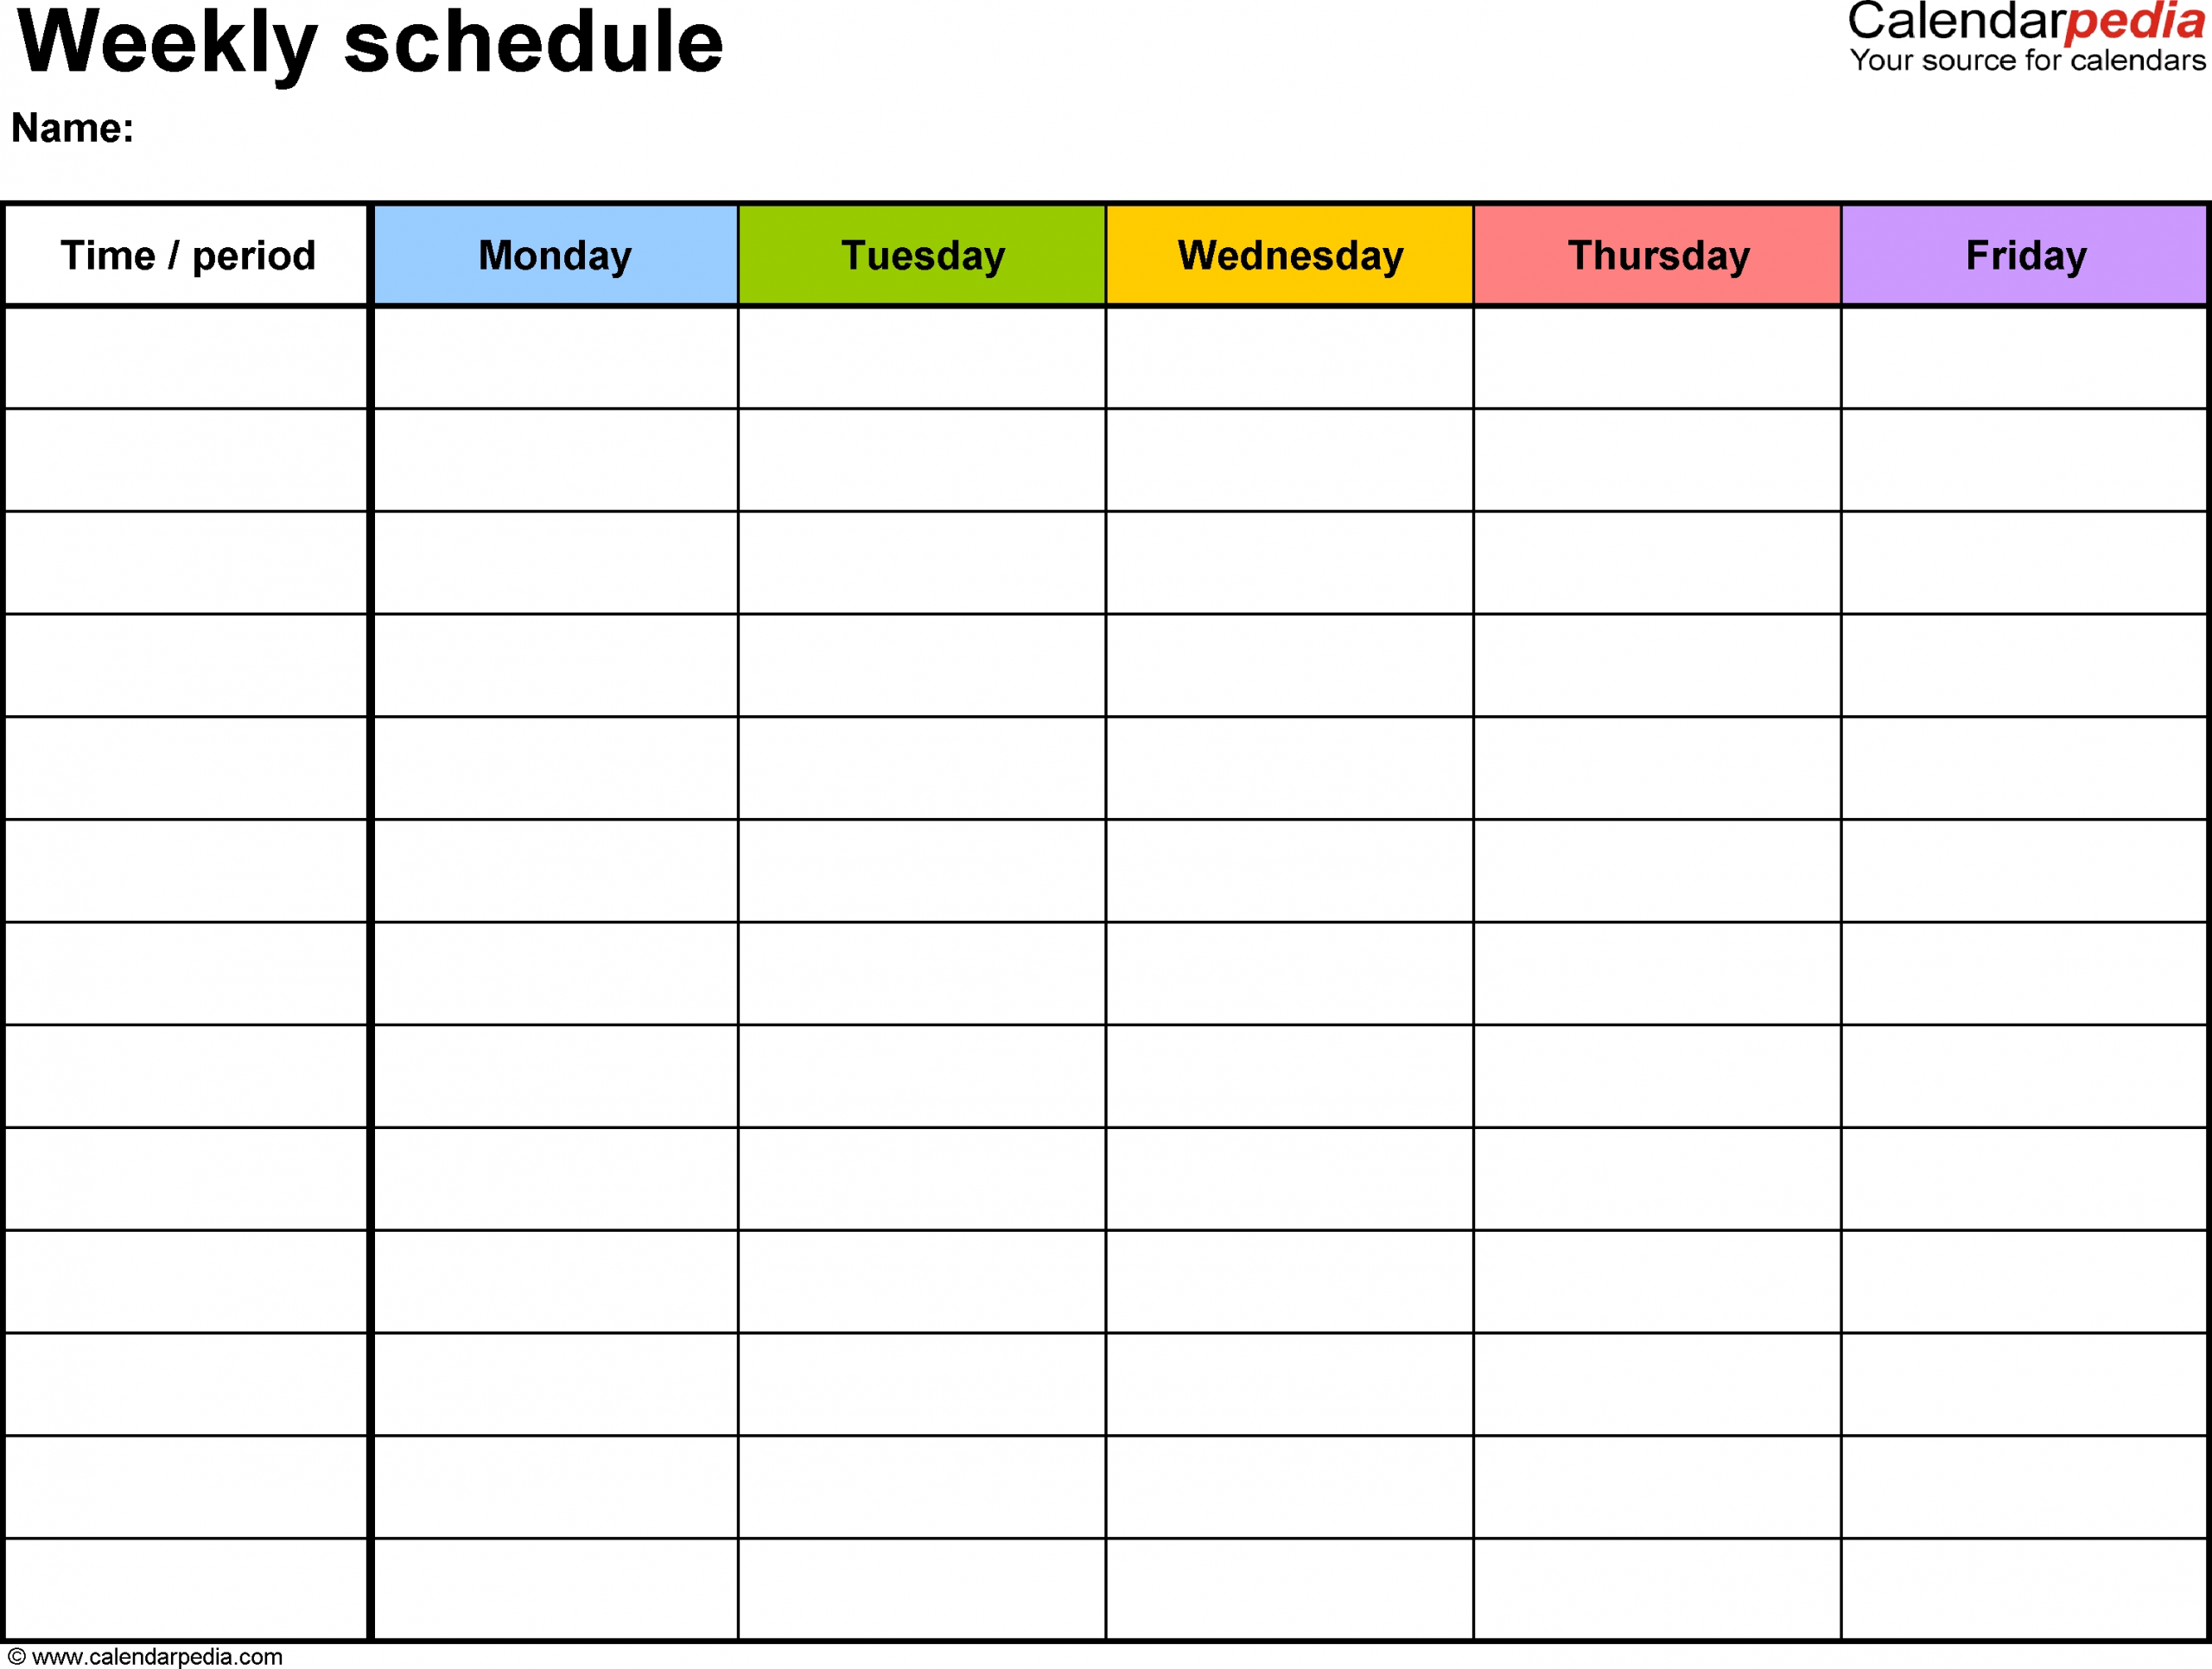 One Week Calendar Template With Hours - Calendar 1 Week Calendar Template